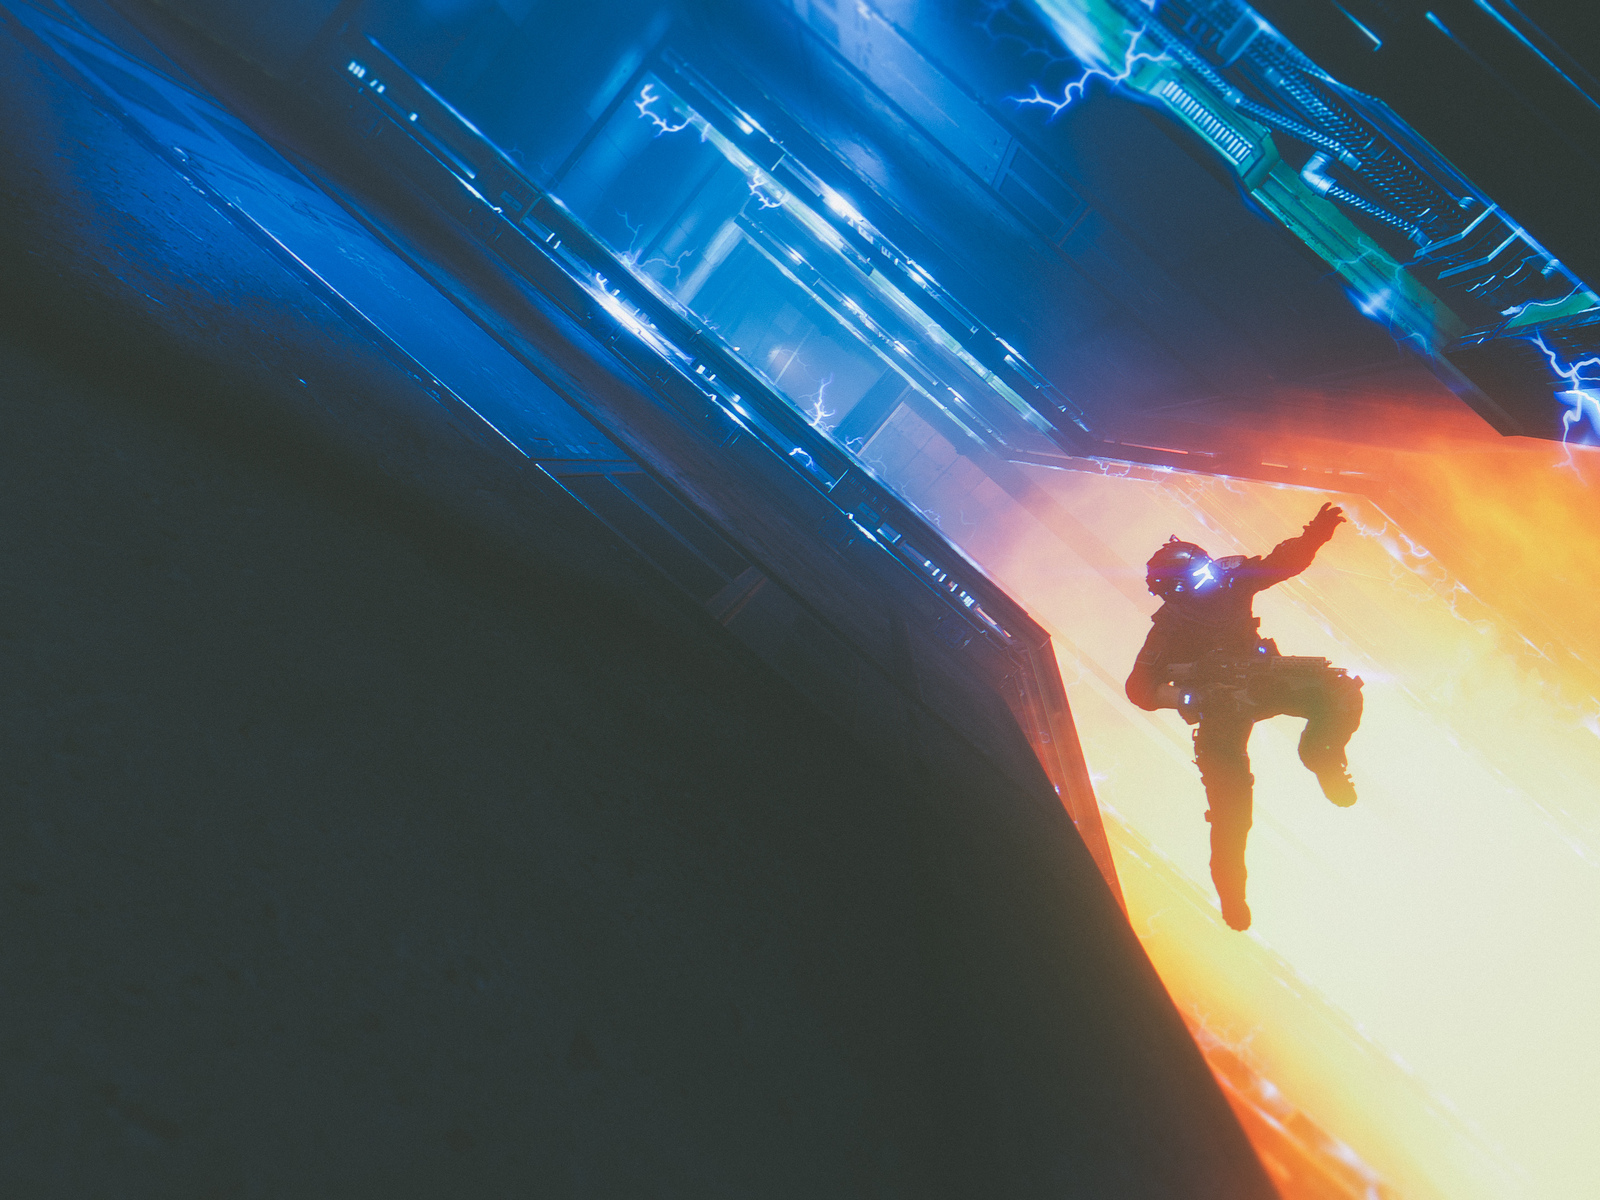 titanfall-2-sunset-ic.jpg